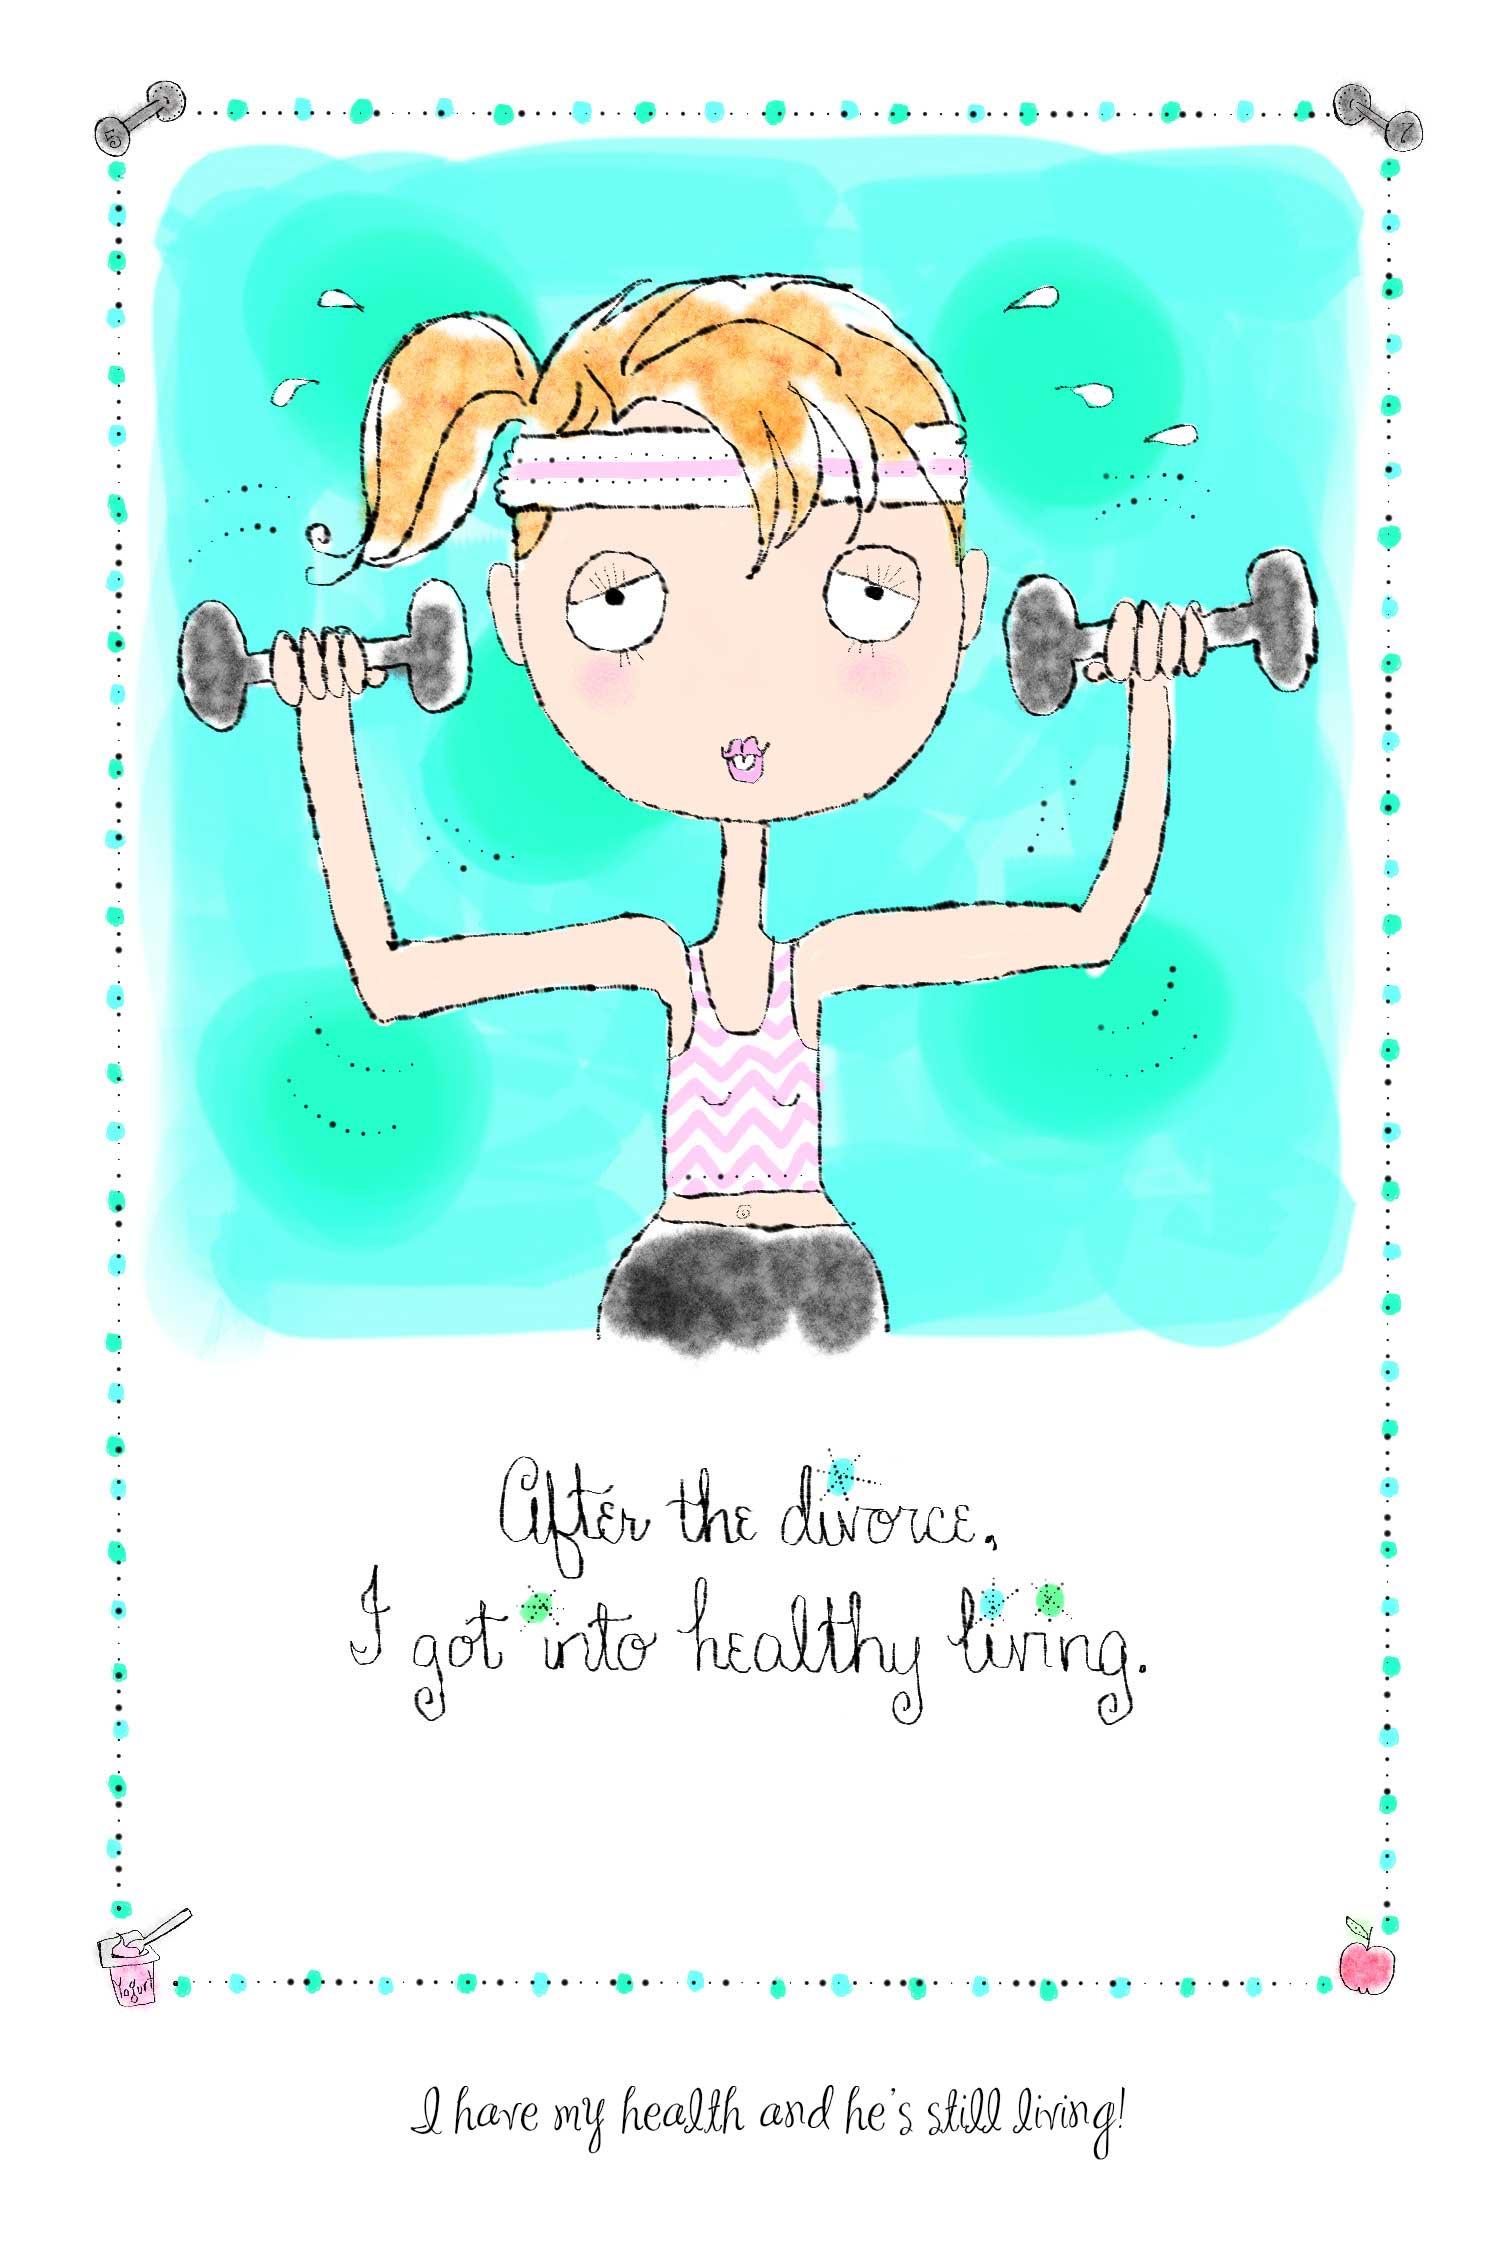 HealthyLiving_GC.jpg